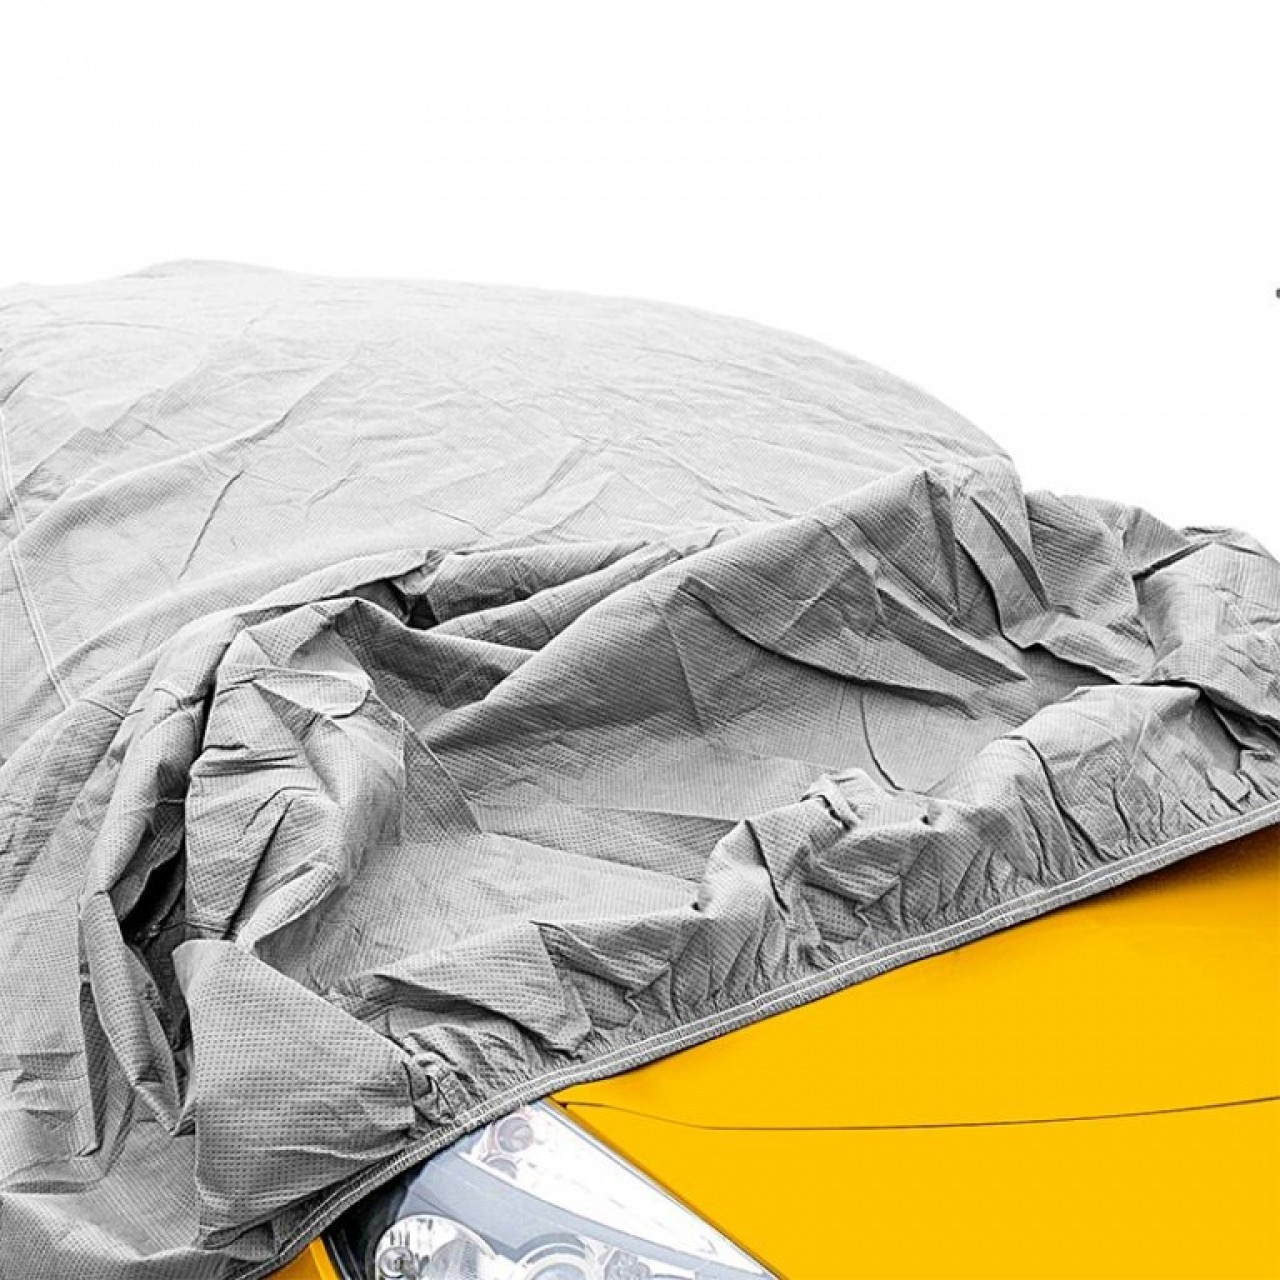 Husa Auto Exterior Impermeabila 3 Straturi Ro Group XXL IN1604